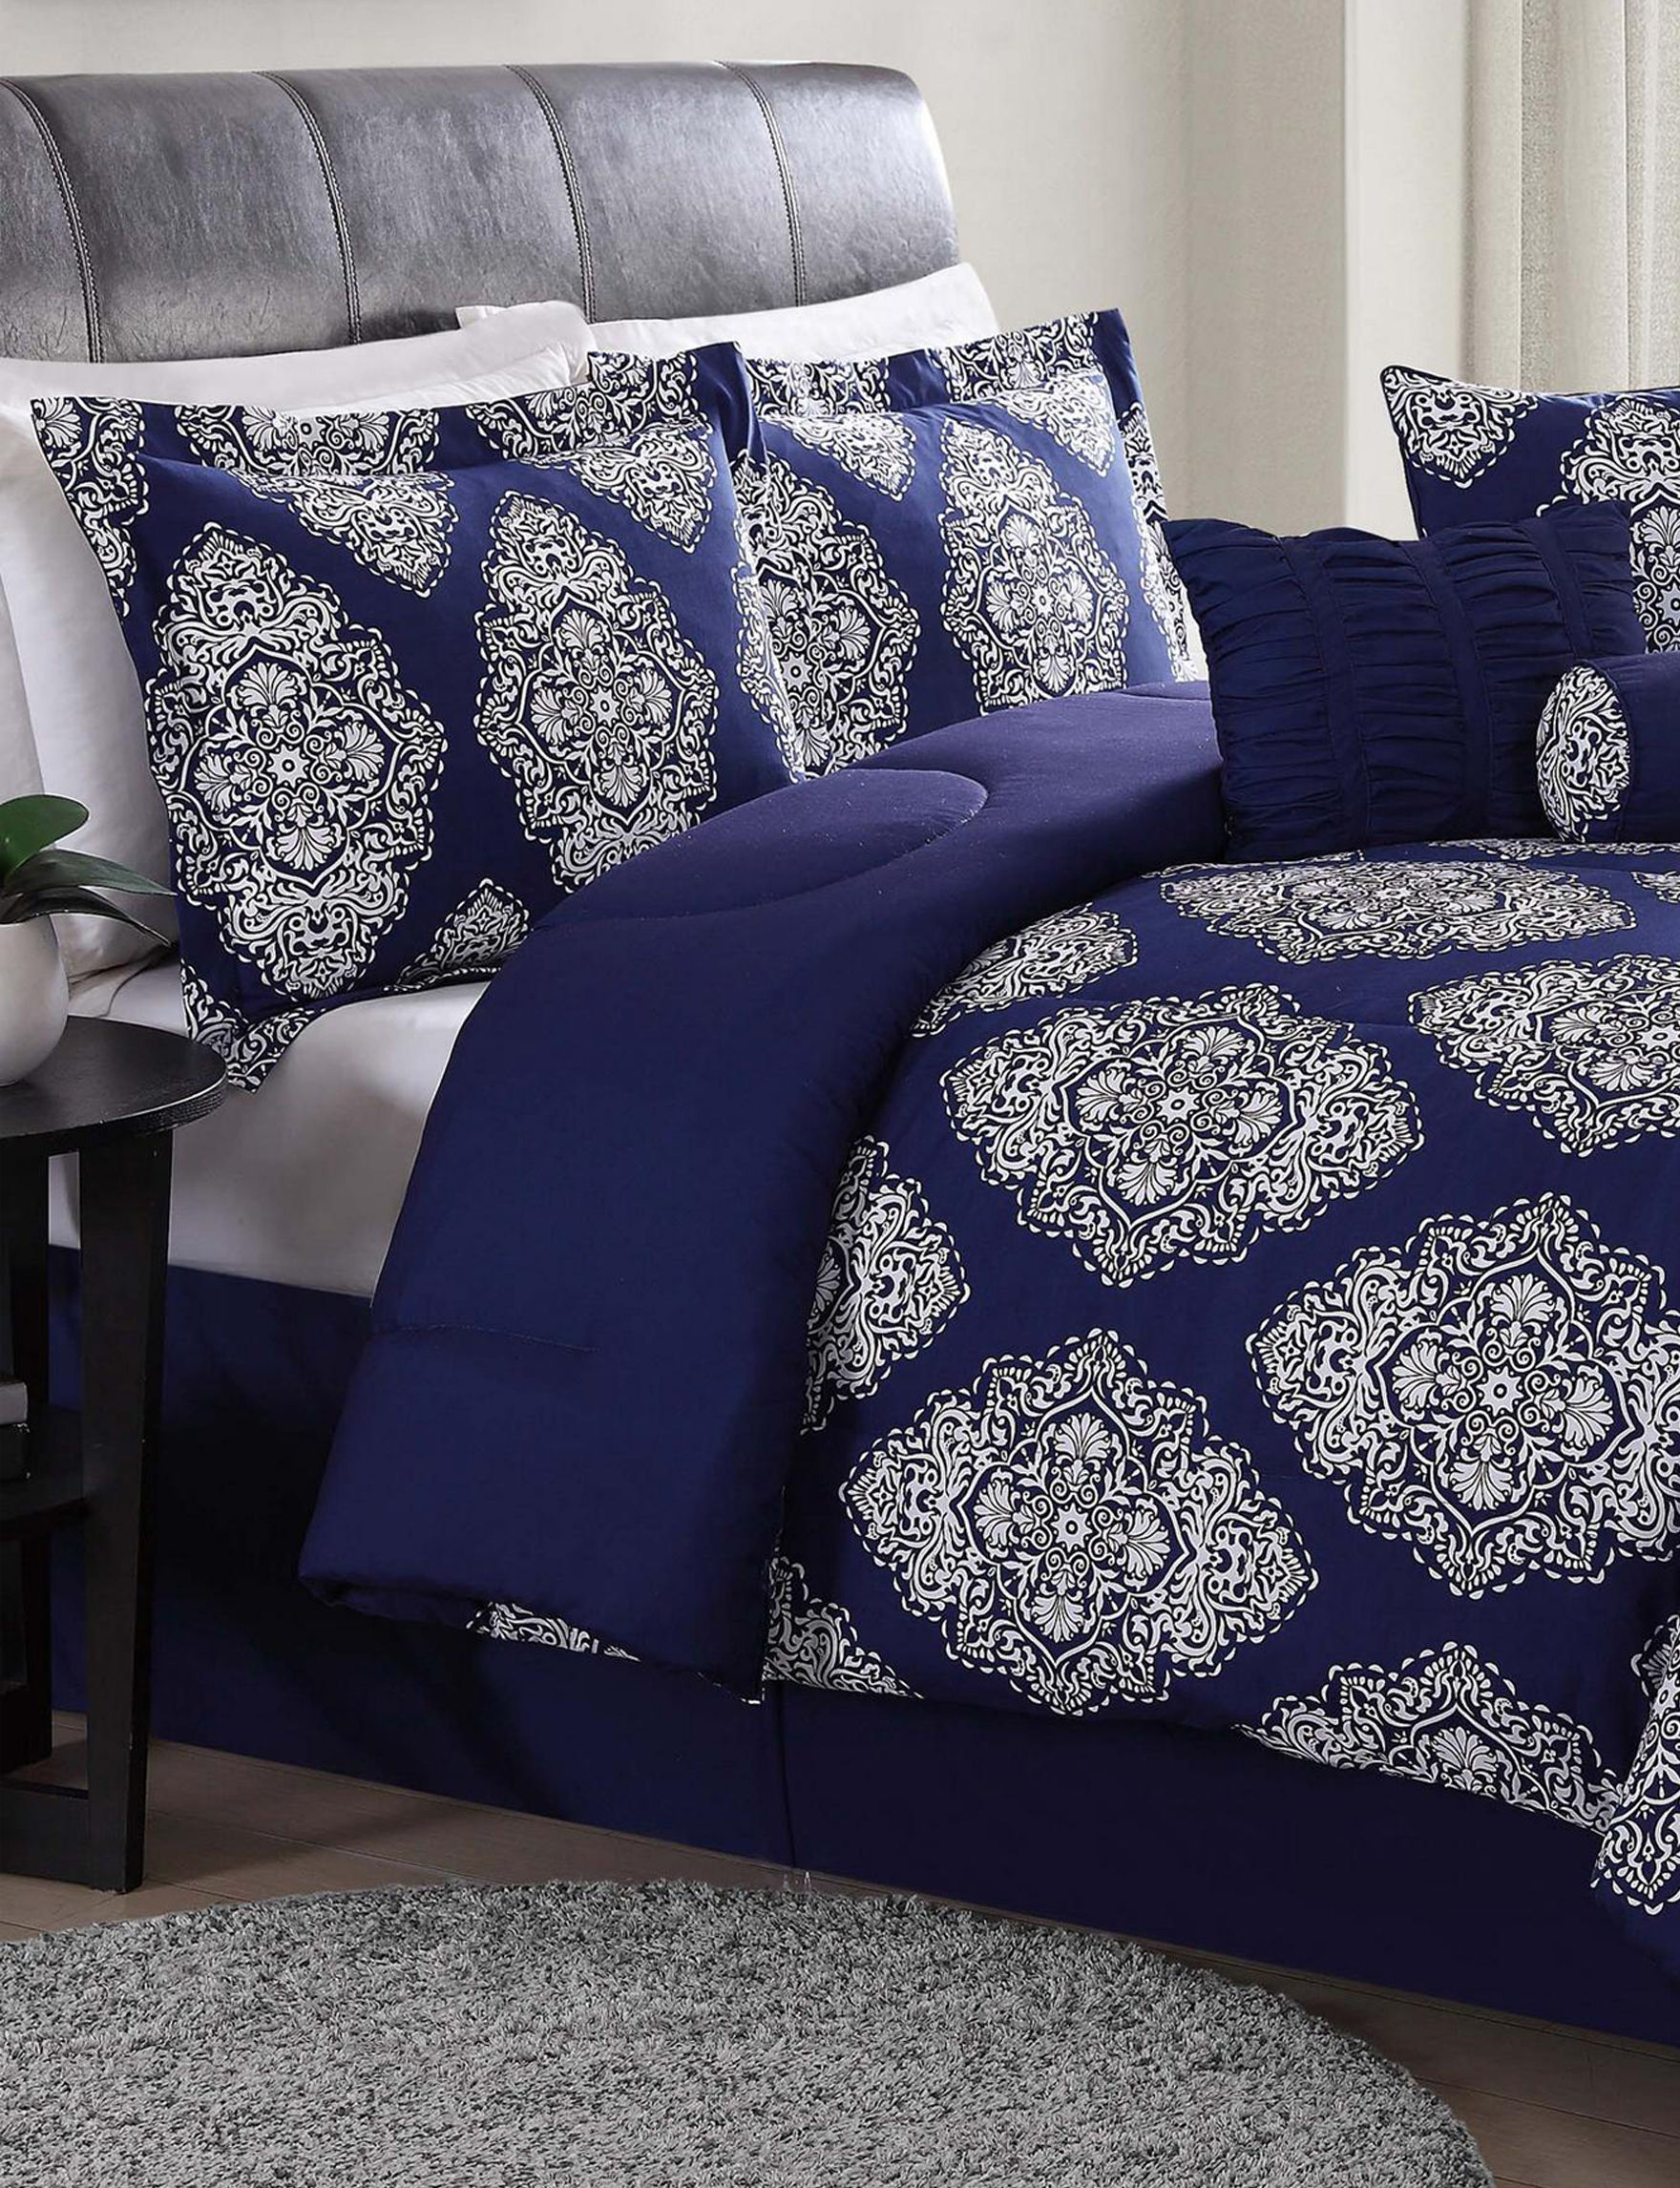 Lifestyles Blue Multi Comforters & Comforter Sets